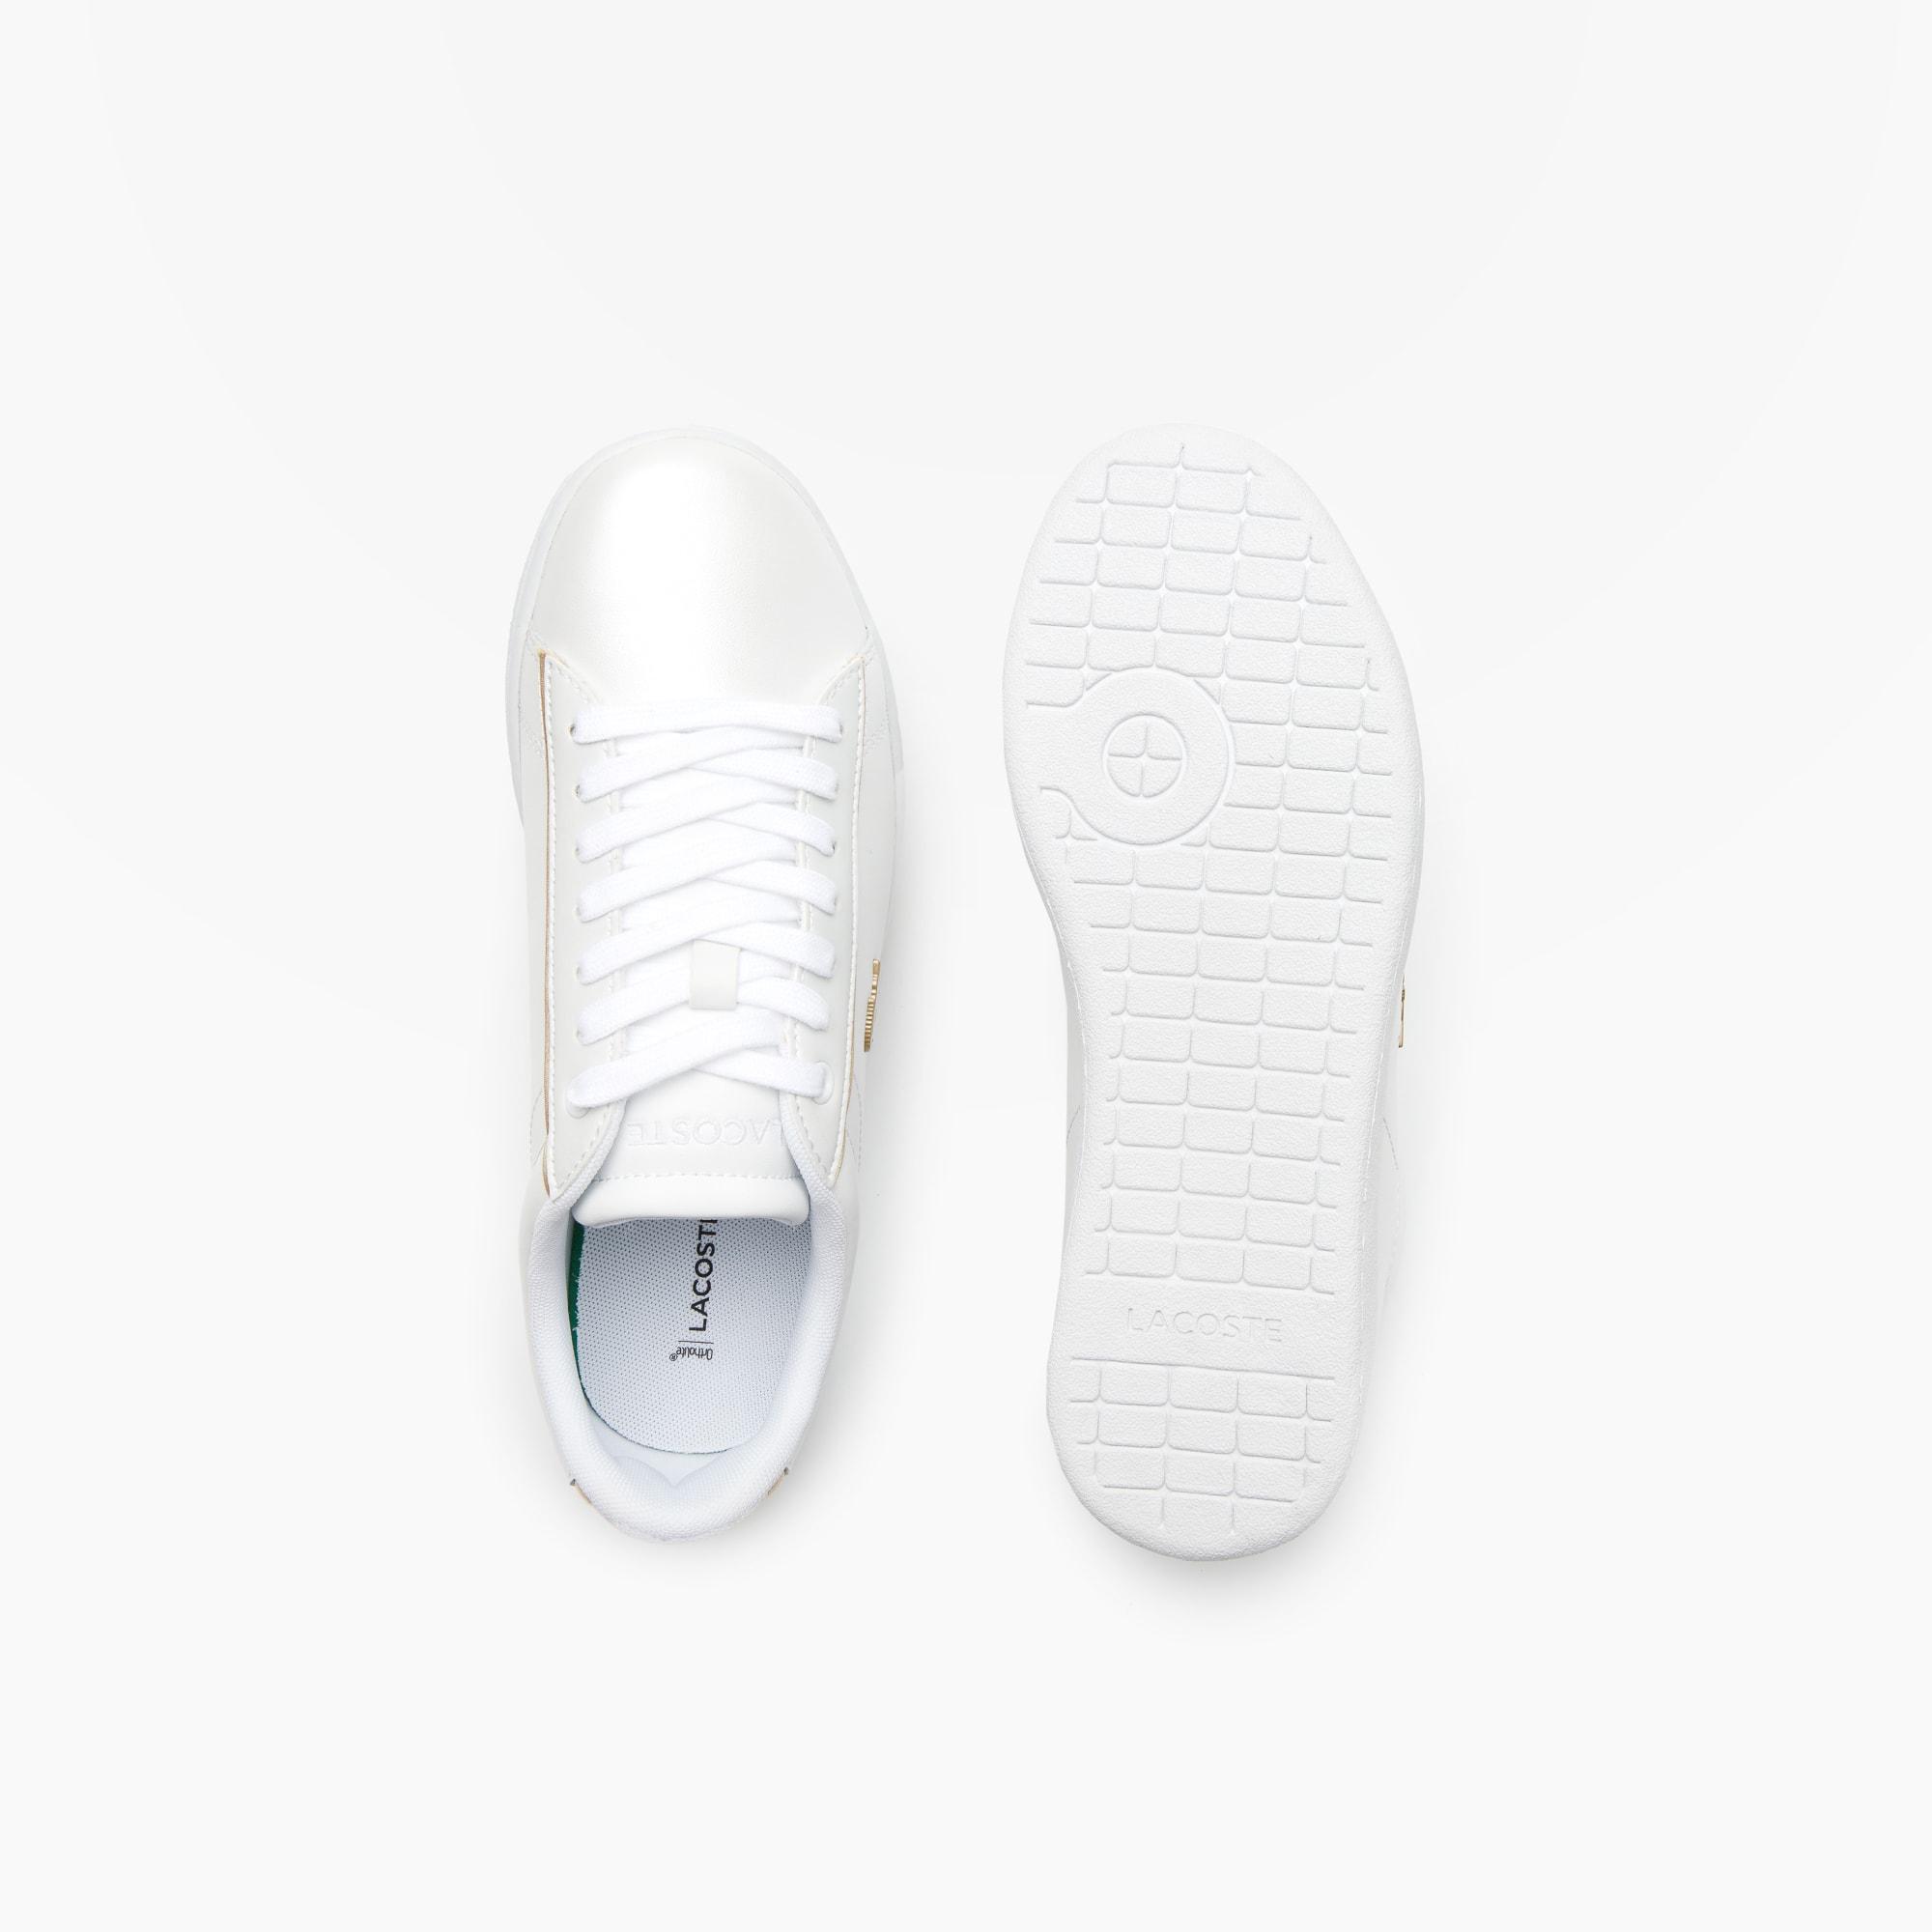 Carnaby Evo en Sneakers cuir LACOSTE nacré qZv71qxn4